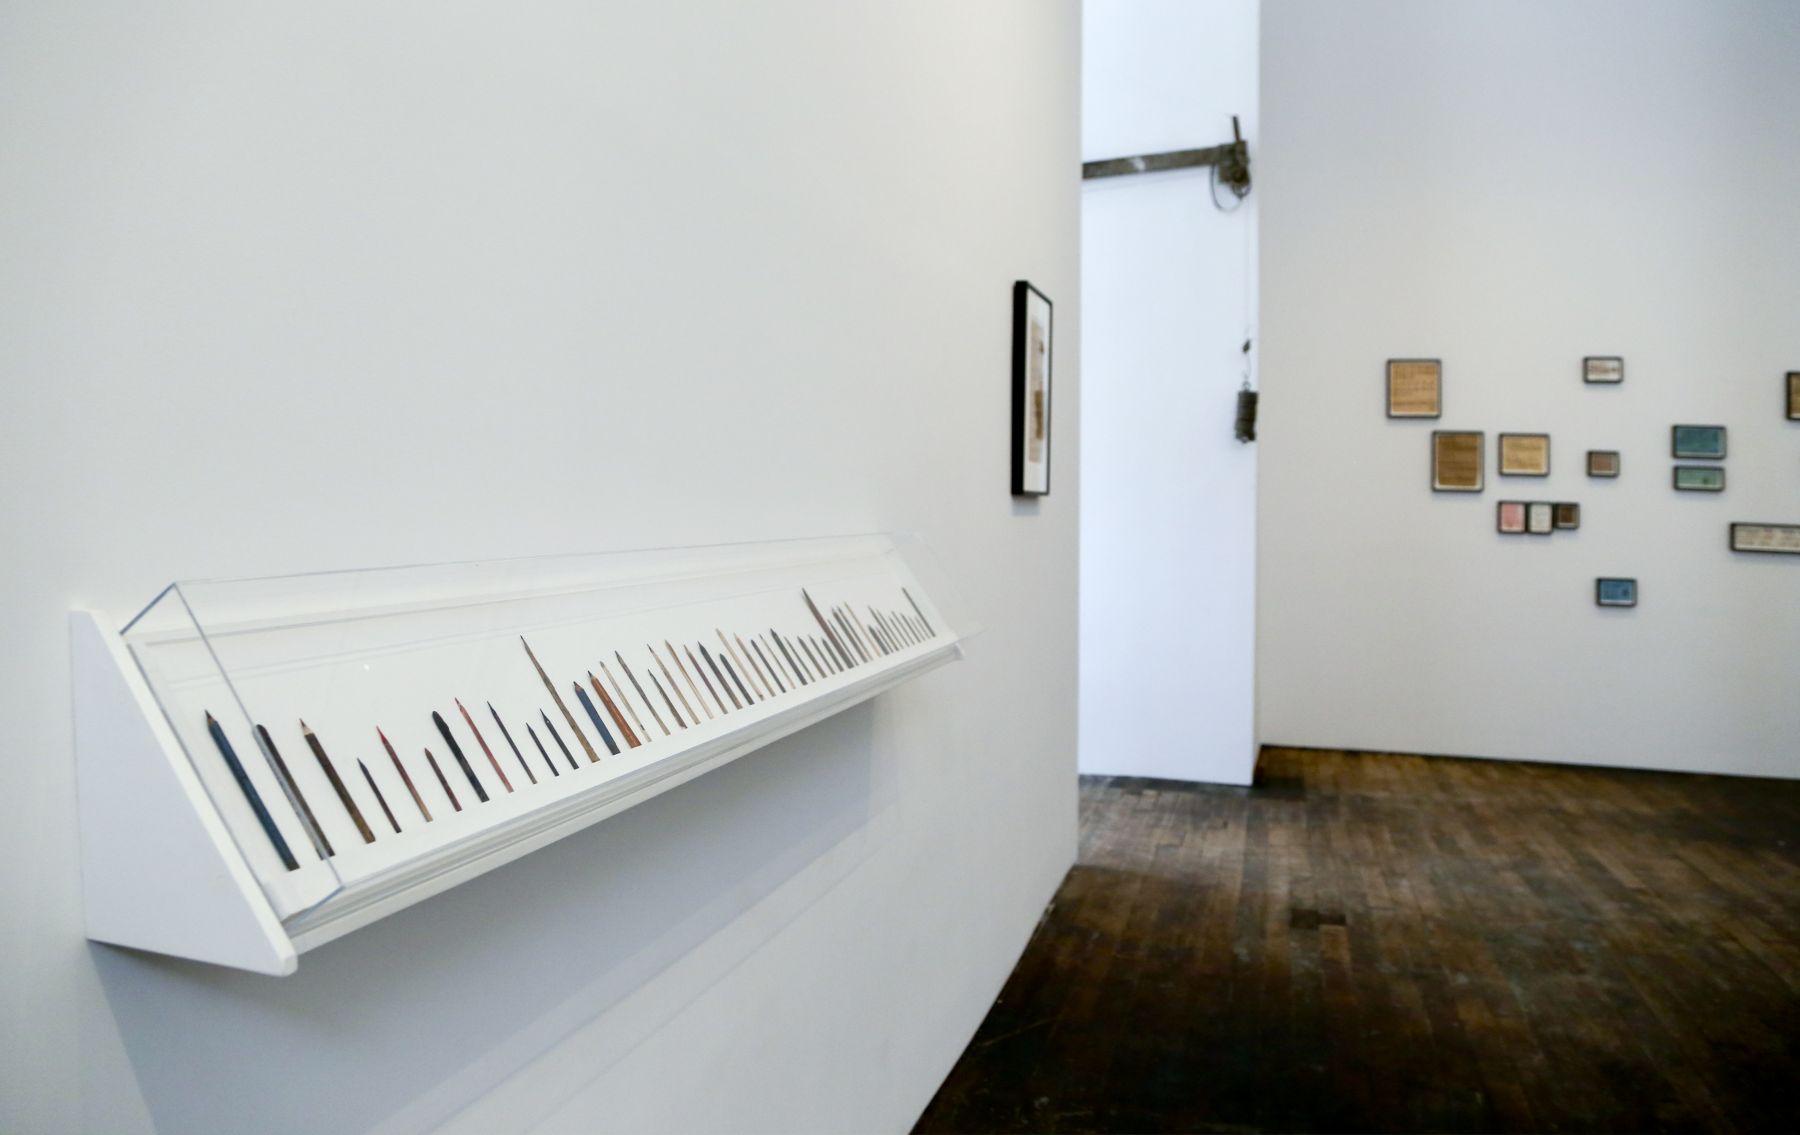 David Adamo / James Castle – installation view 2